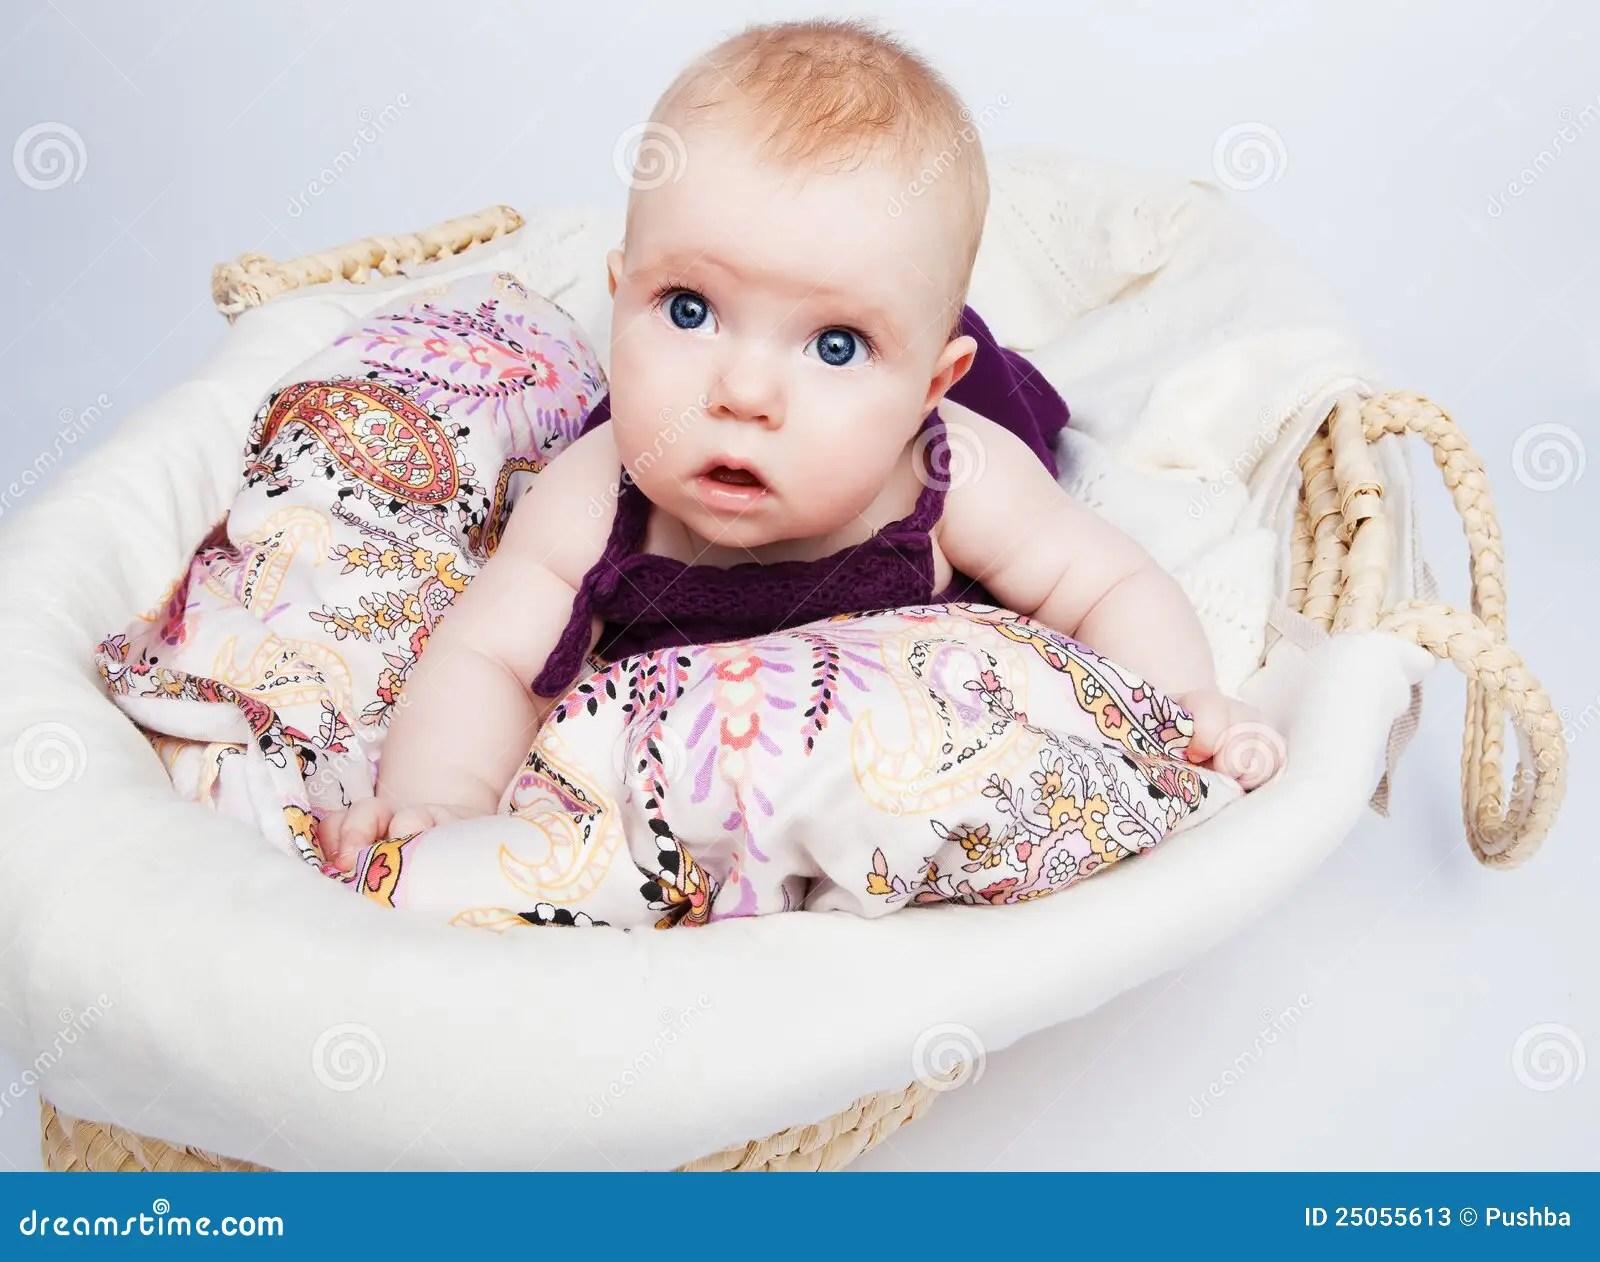 Boy Proposing Girl Hd Wallpaper Cute Little Baby Girl Hot Girls Wallpaper